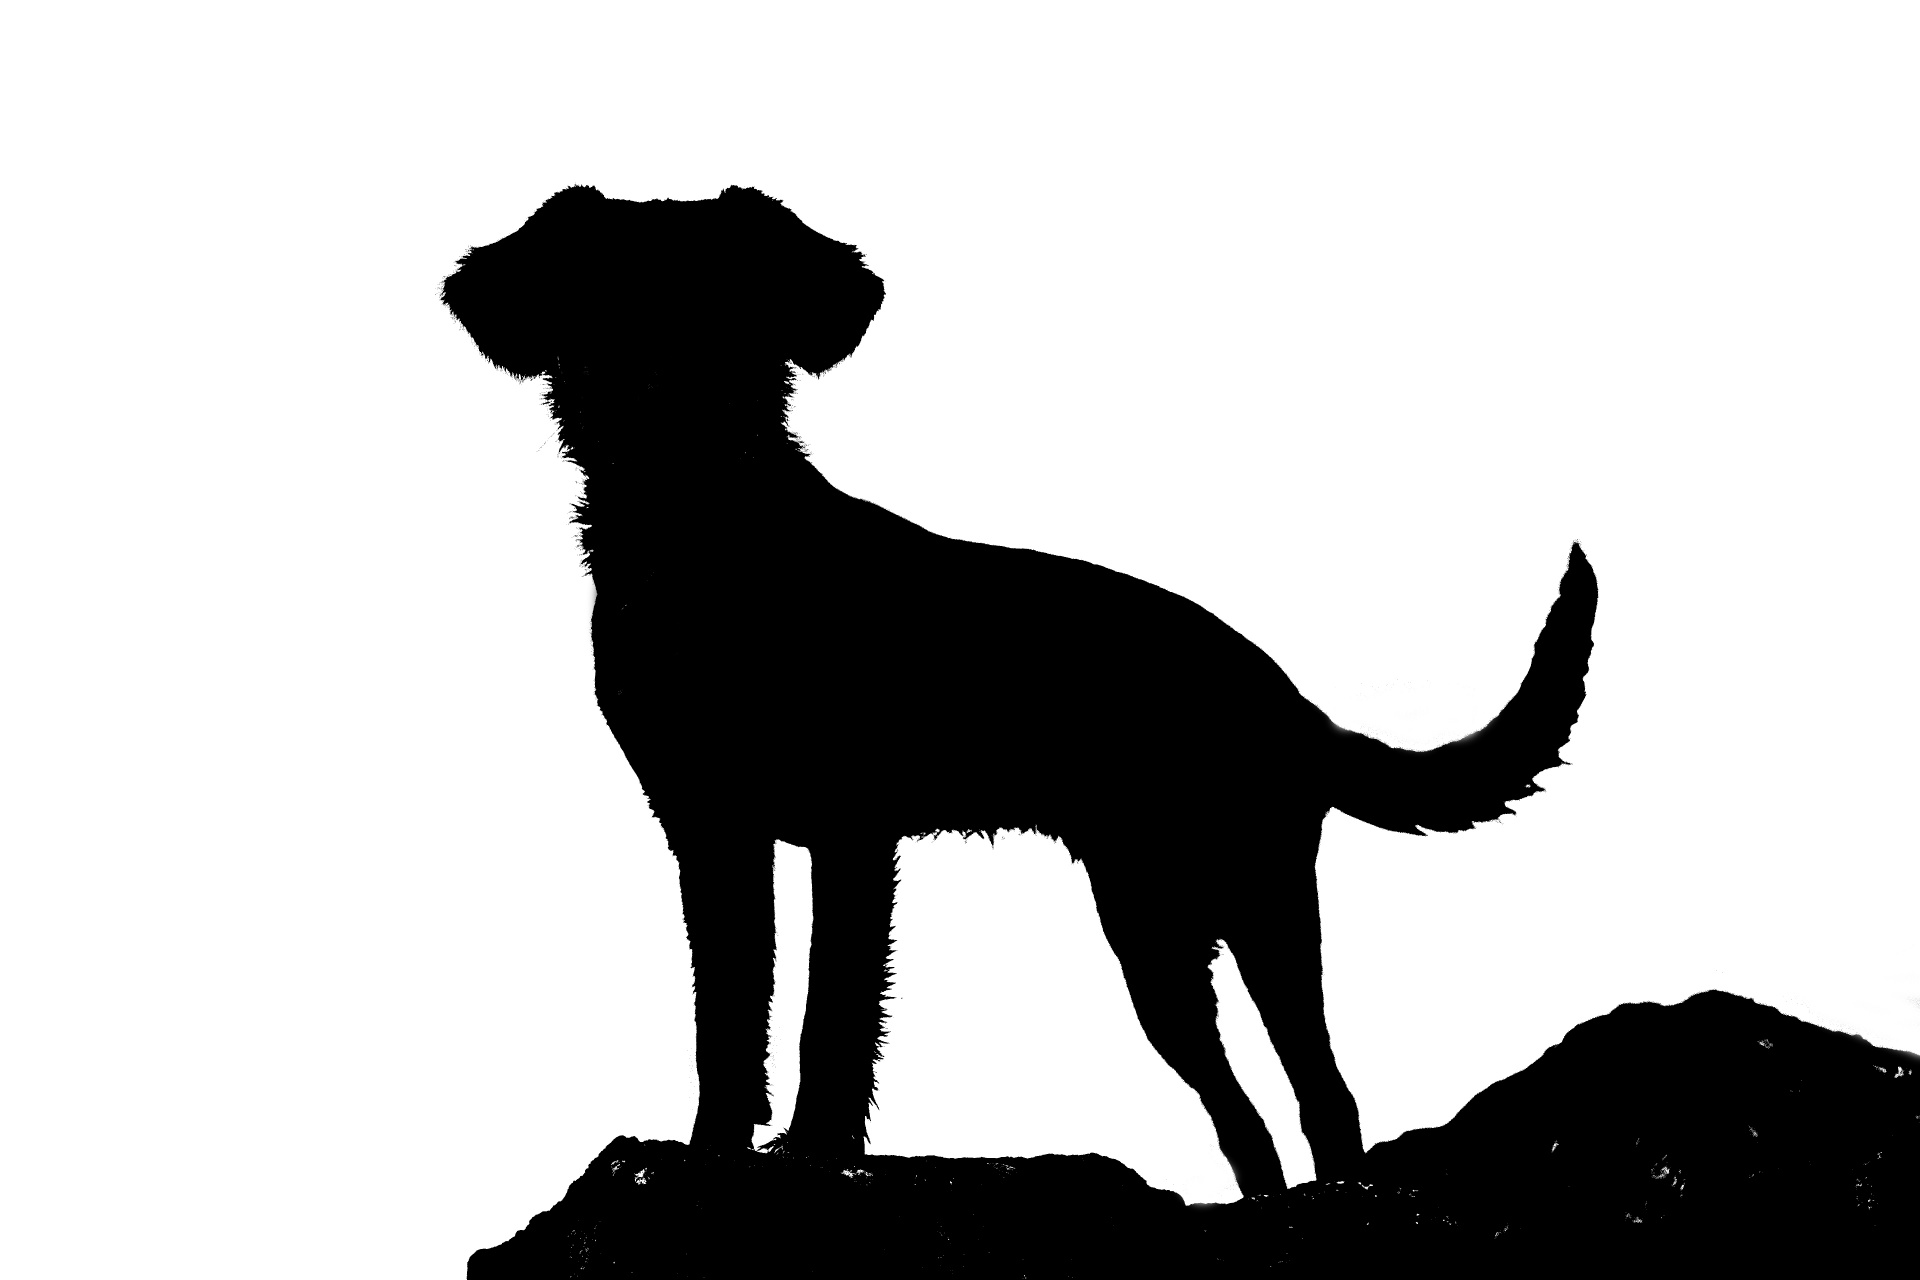 1920x1280 Silhouette Of Dog Free Stock Photo